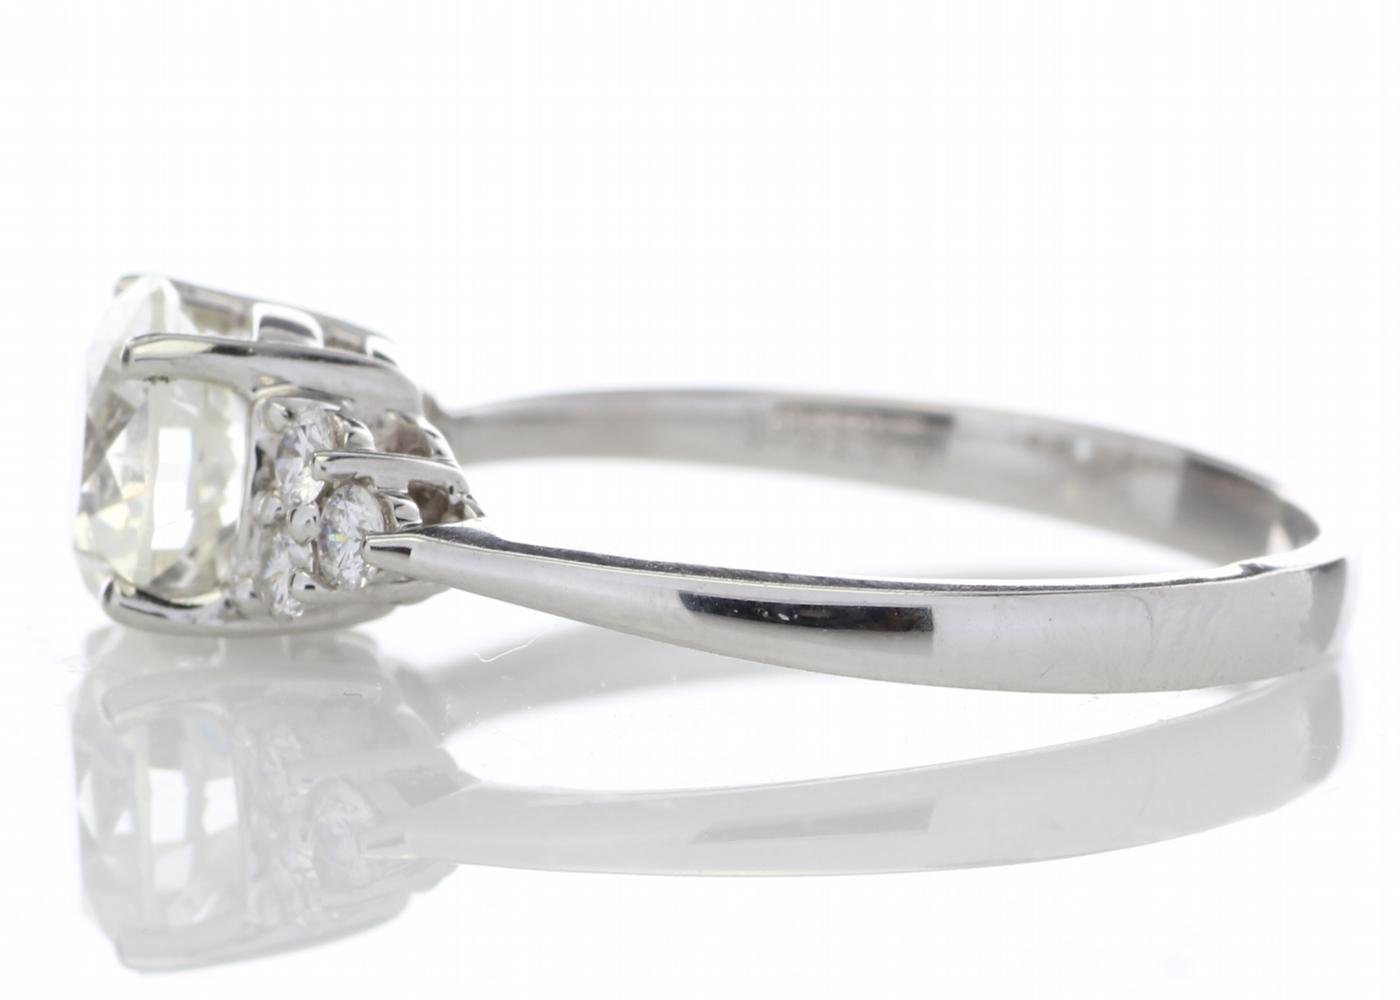 18ct White Gold Heart Shape Diamond Ring 1.29 Carats - Image 3 of 5